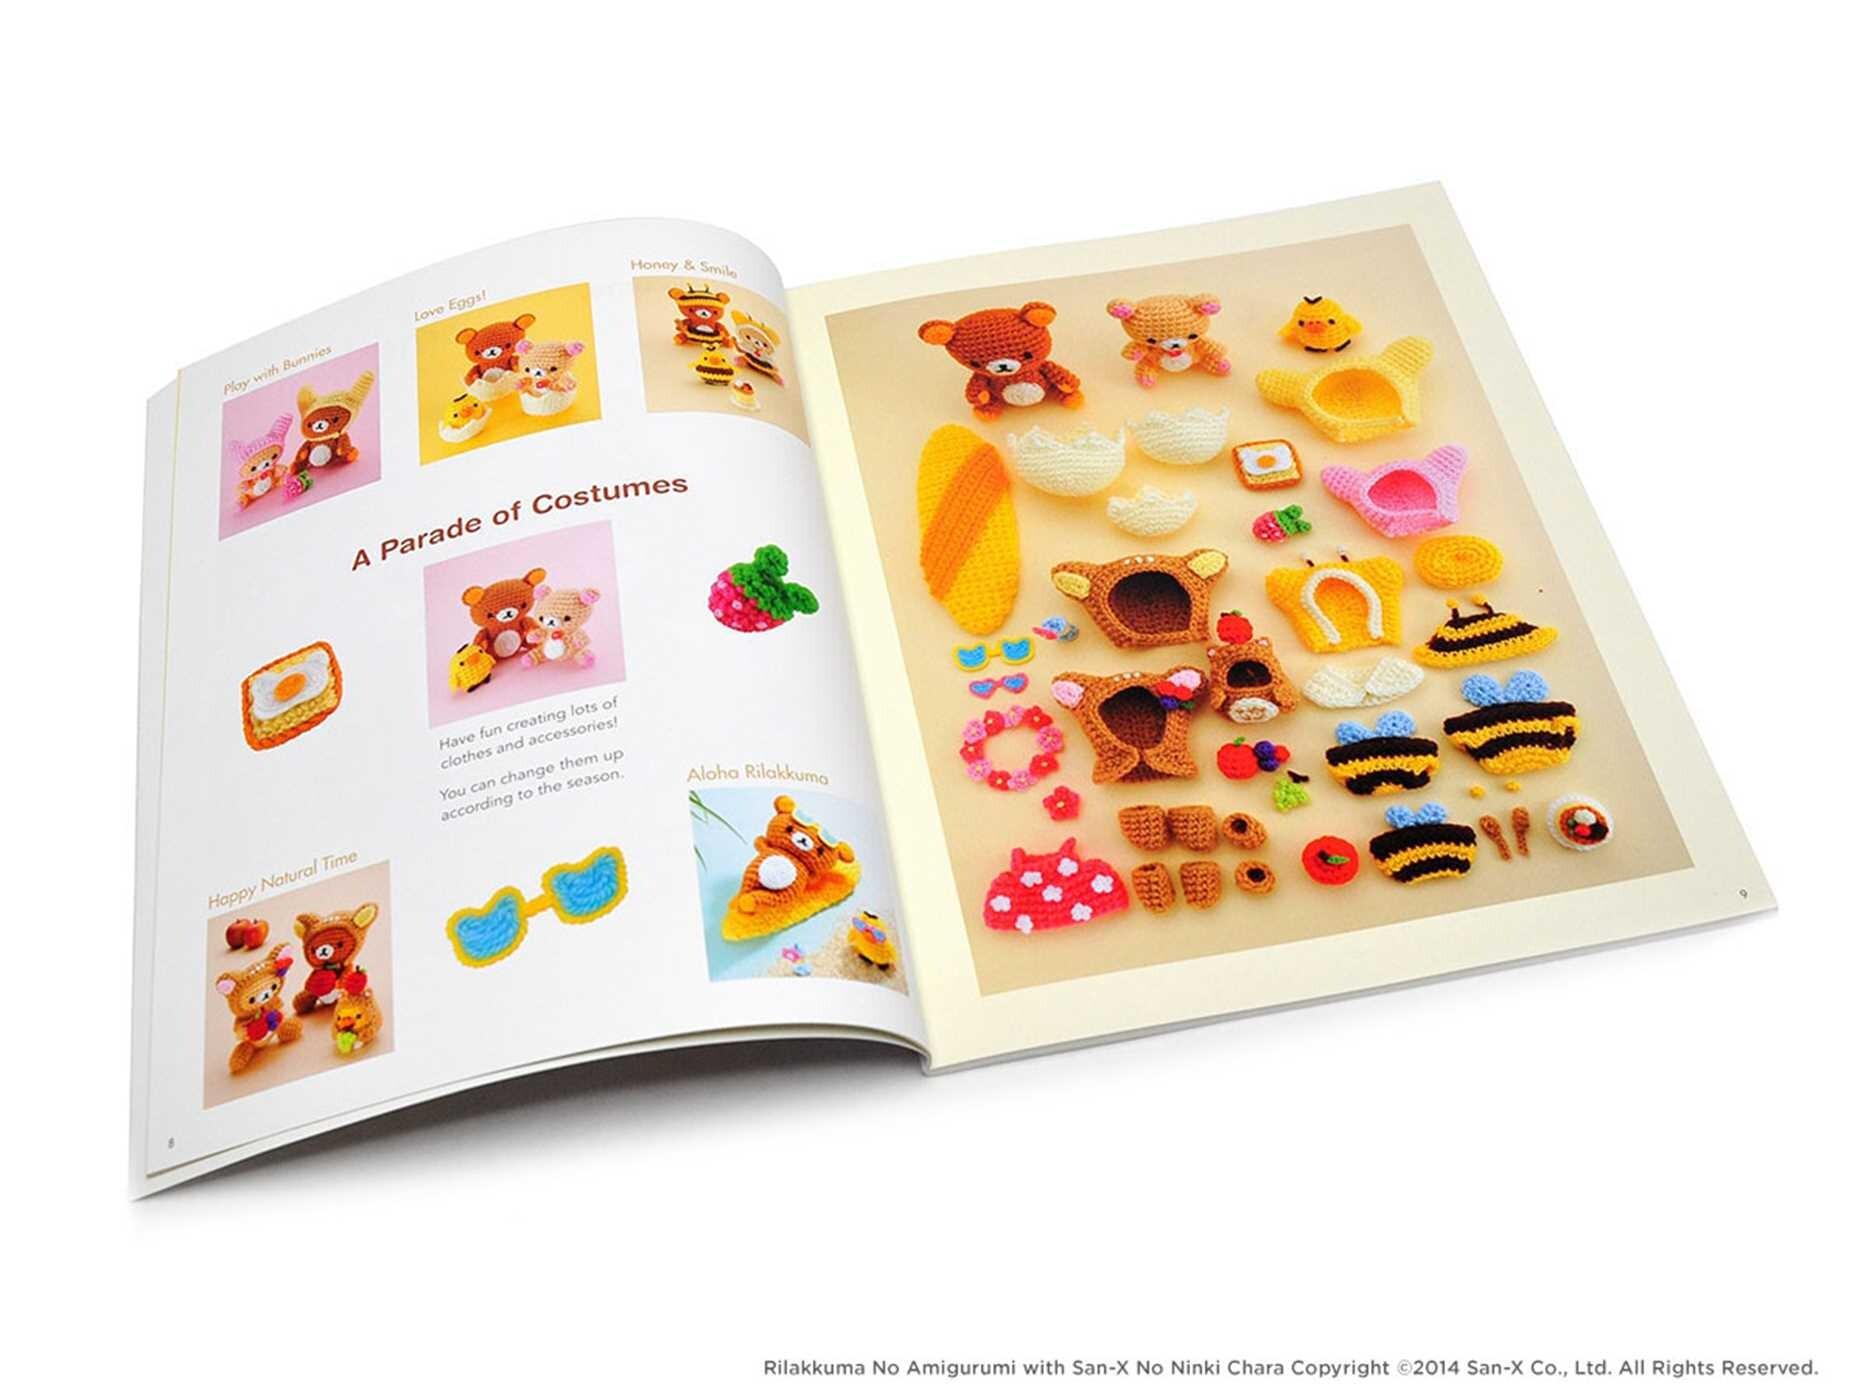 Amigurumi san x crochet patterns 9781421598734.in02